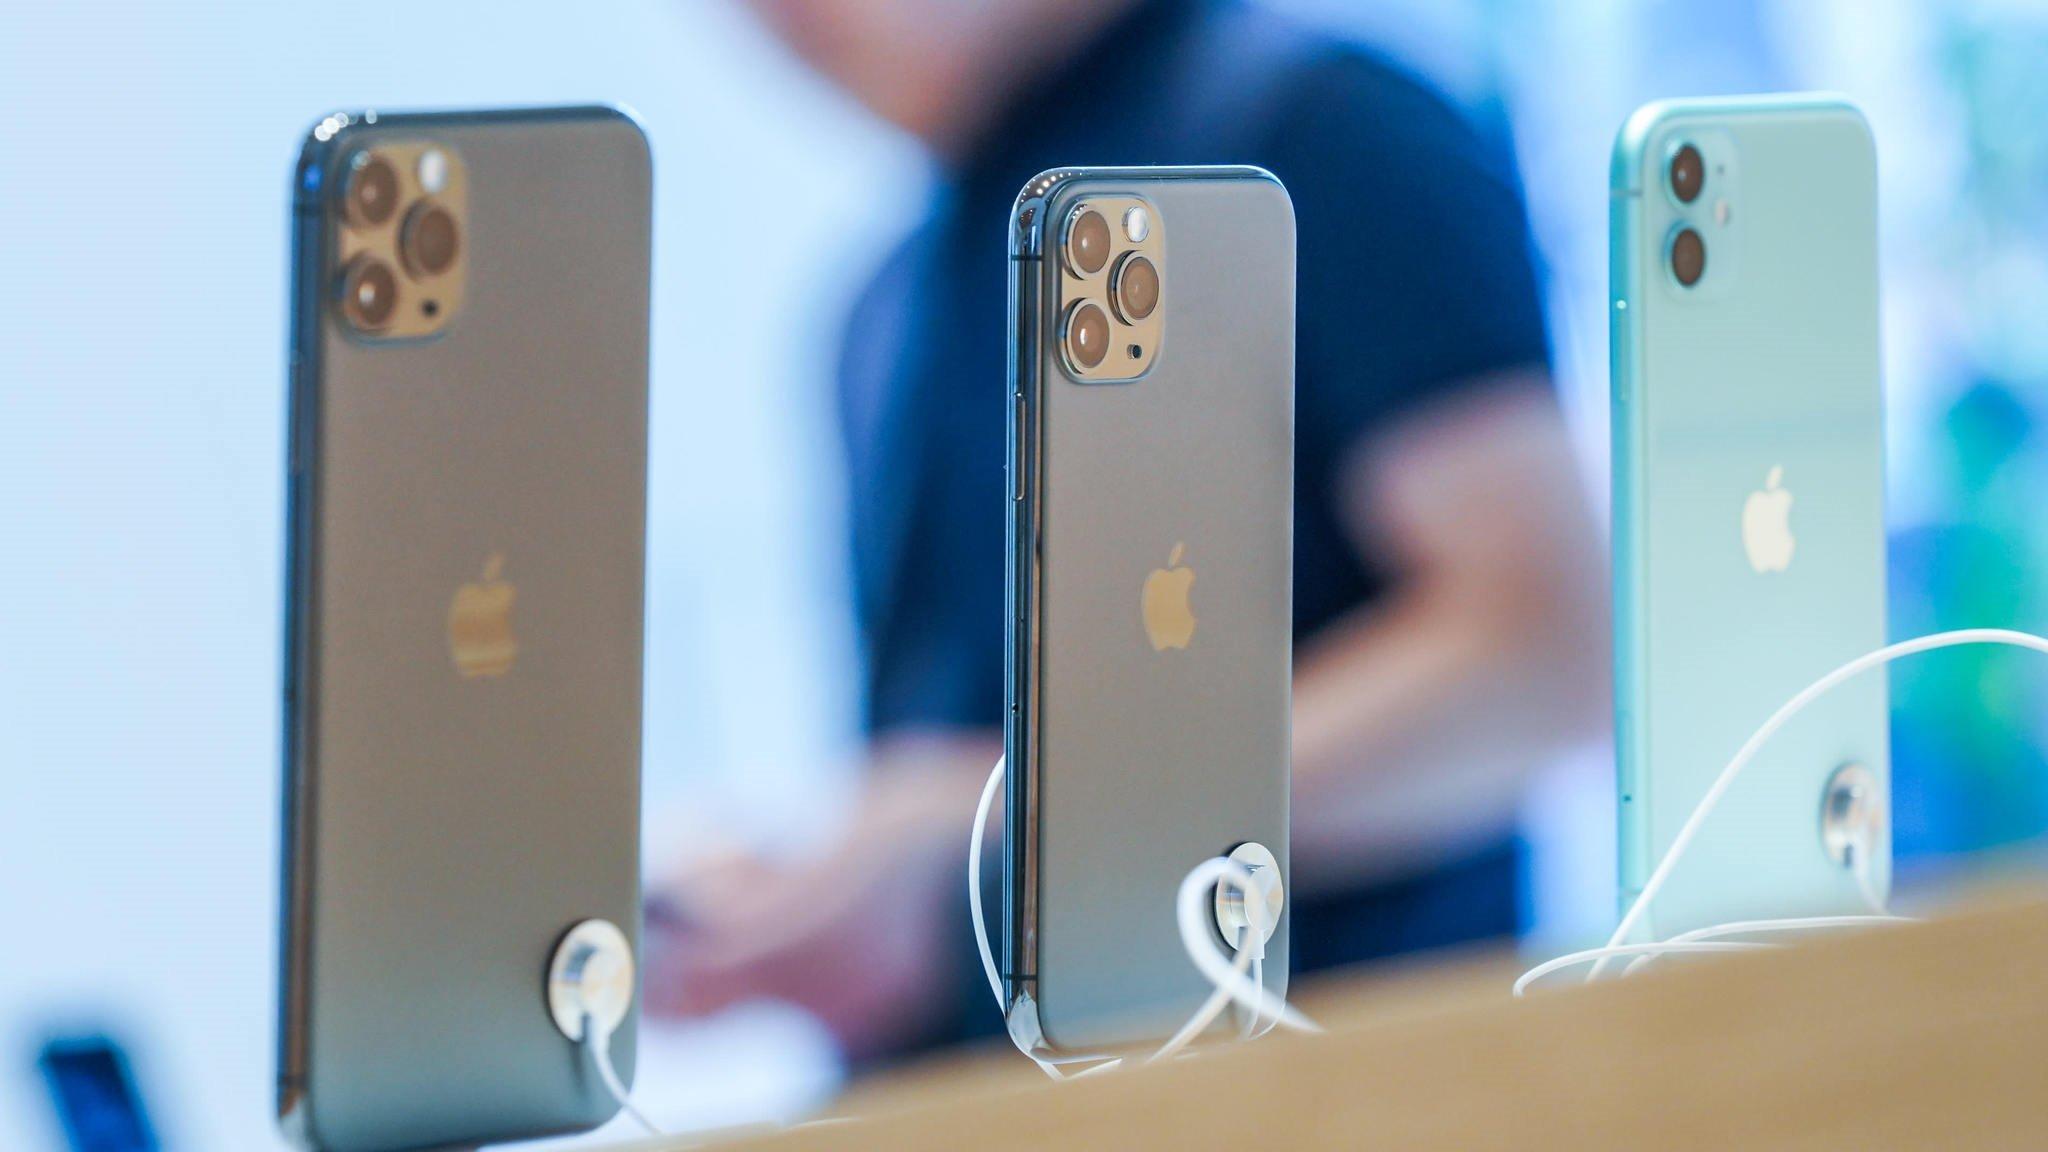 Apple ограничила онлайн-продажи iPhone двумя экземплярами одной модели на человека - 1